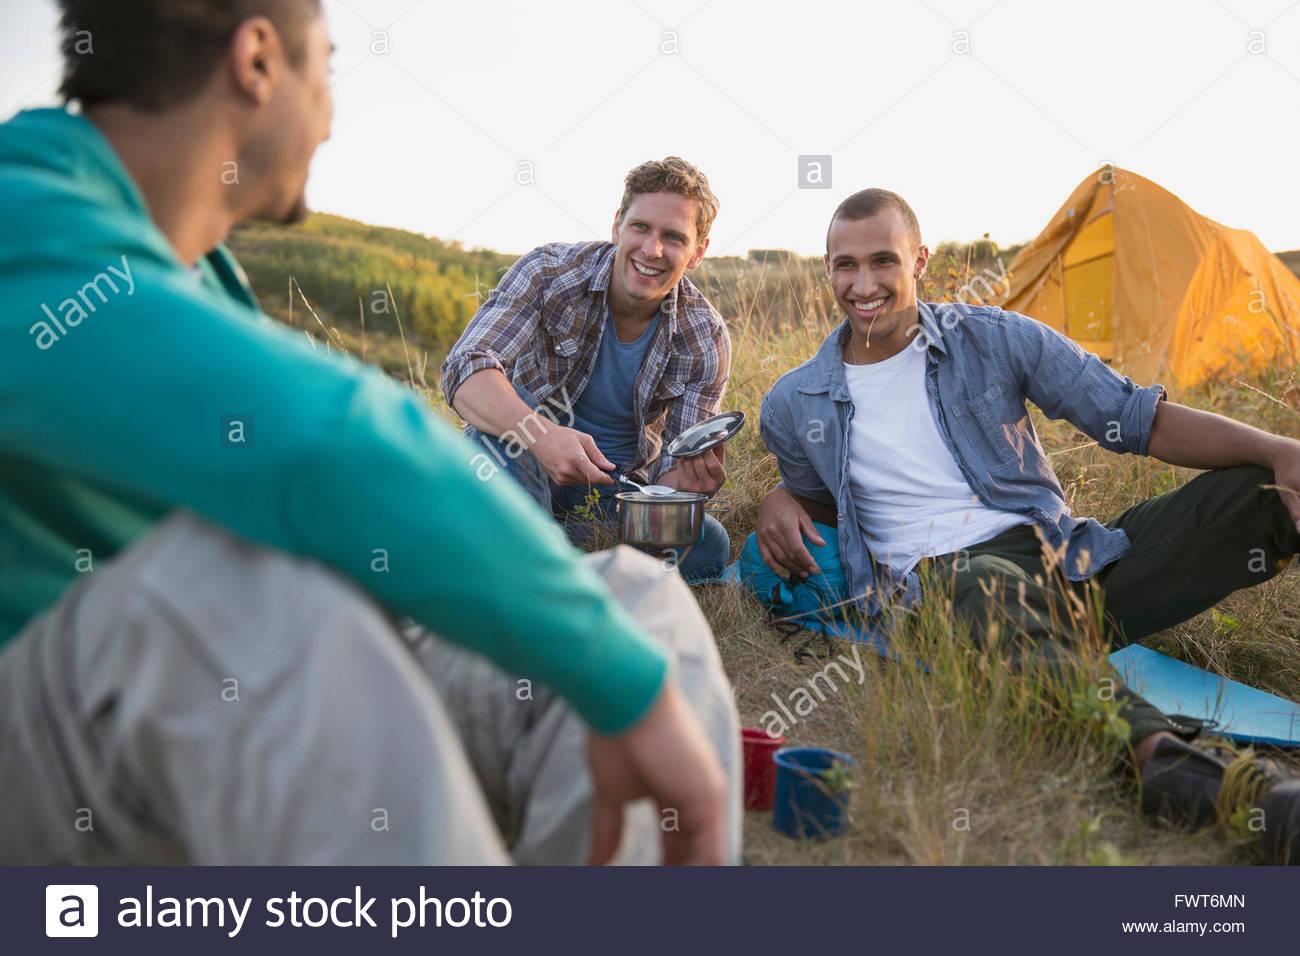 Three men sharing a laugh while camping. - Stock Image